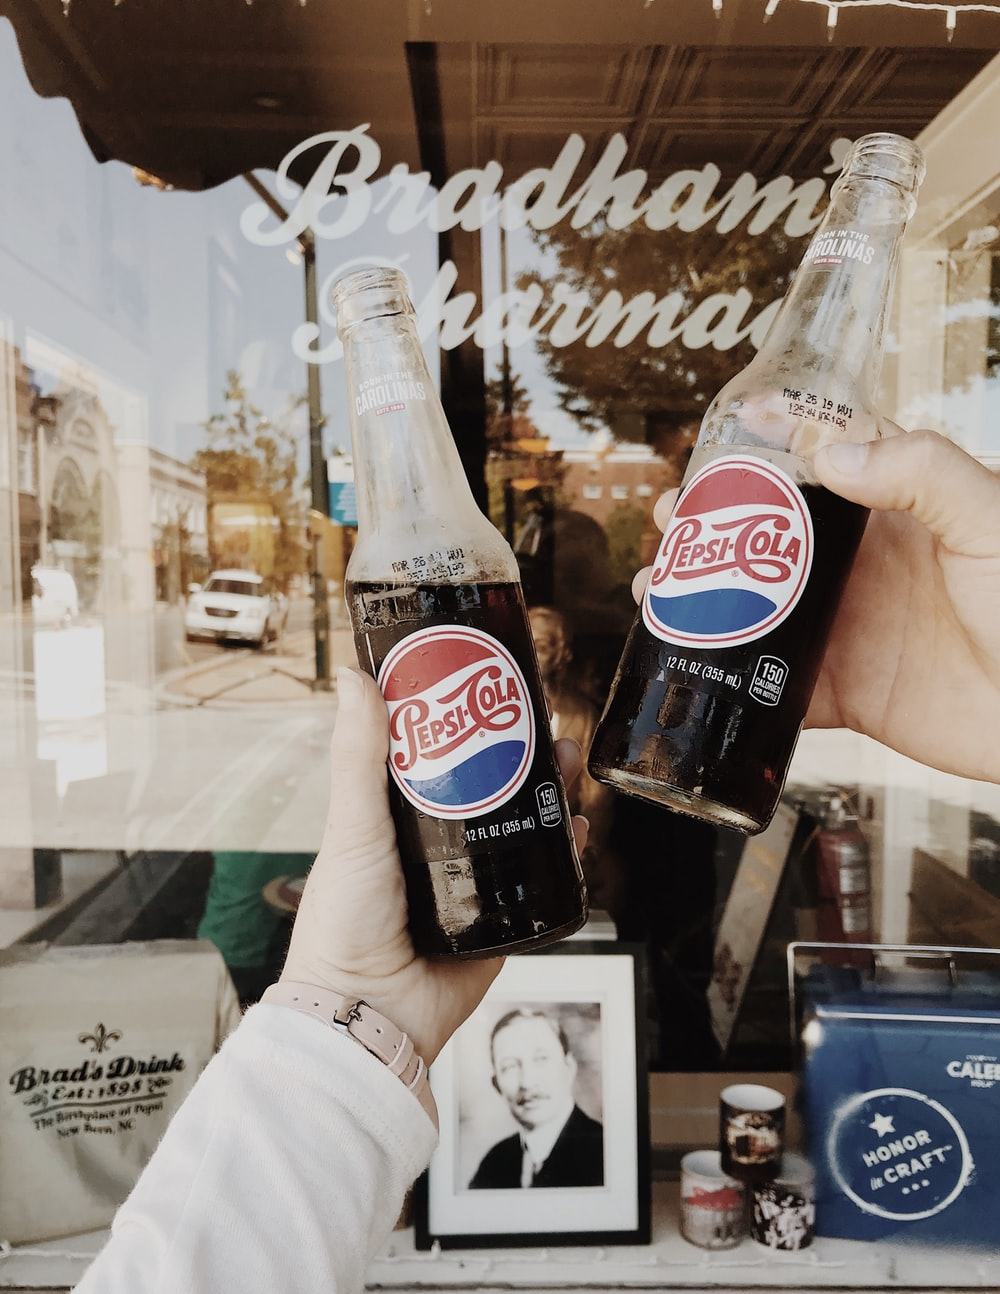 person holding Pepsi Cola soda bottles